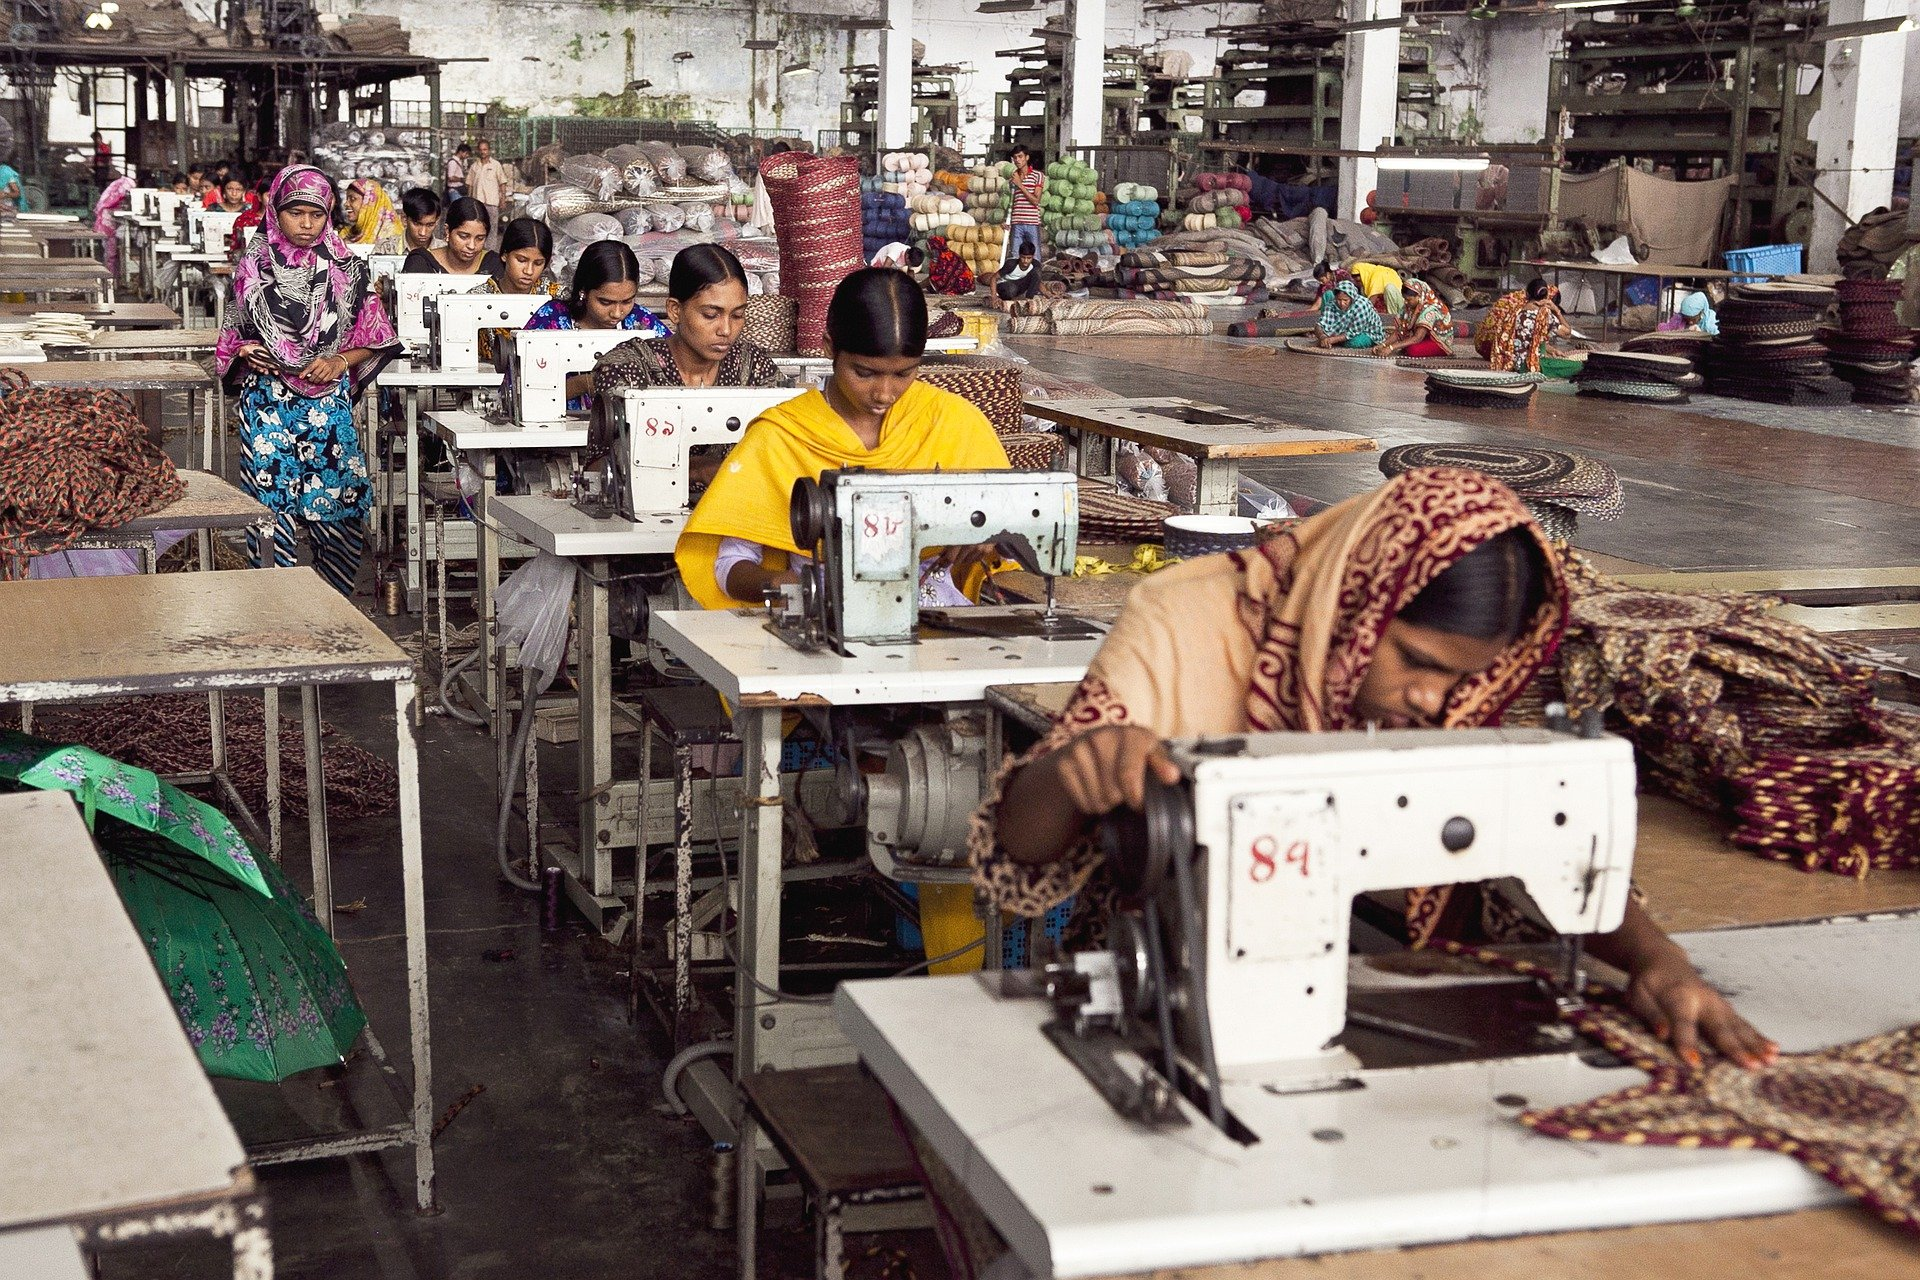 Women garment workers in a factory